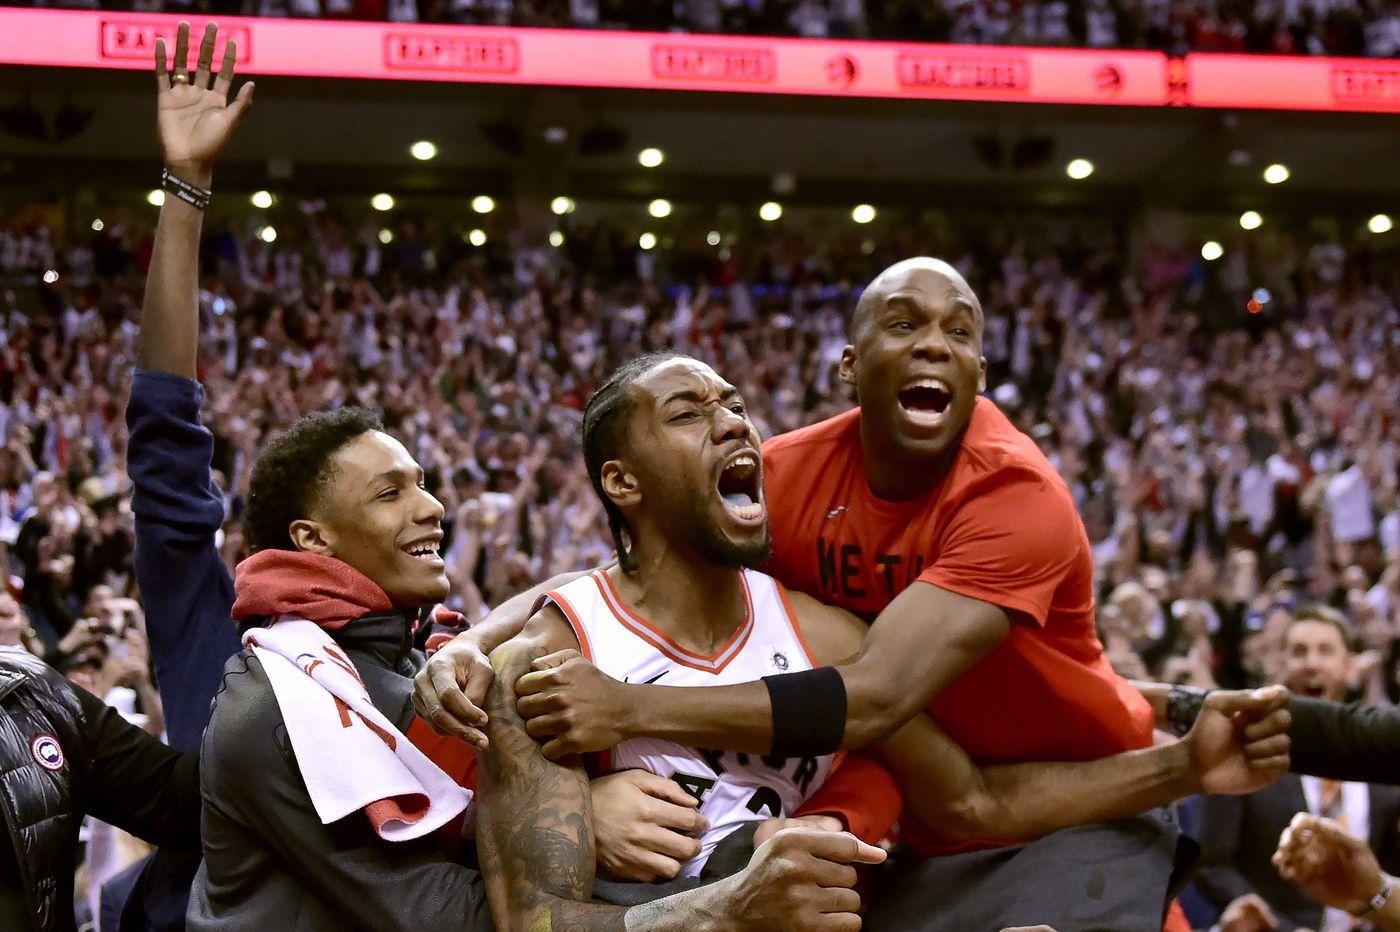 Watch: Raptors' Kawhi Leonard sinks game-winner to beat Sixers in Game 7